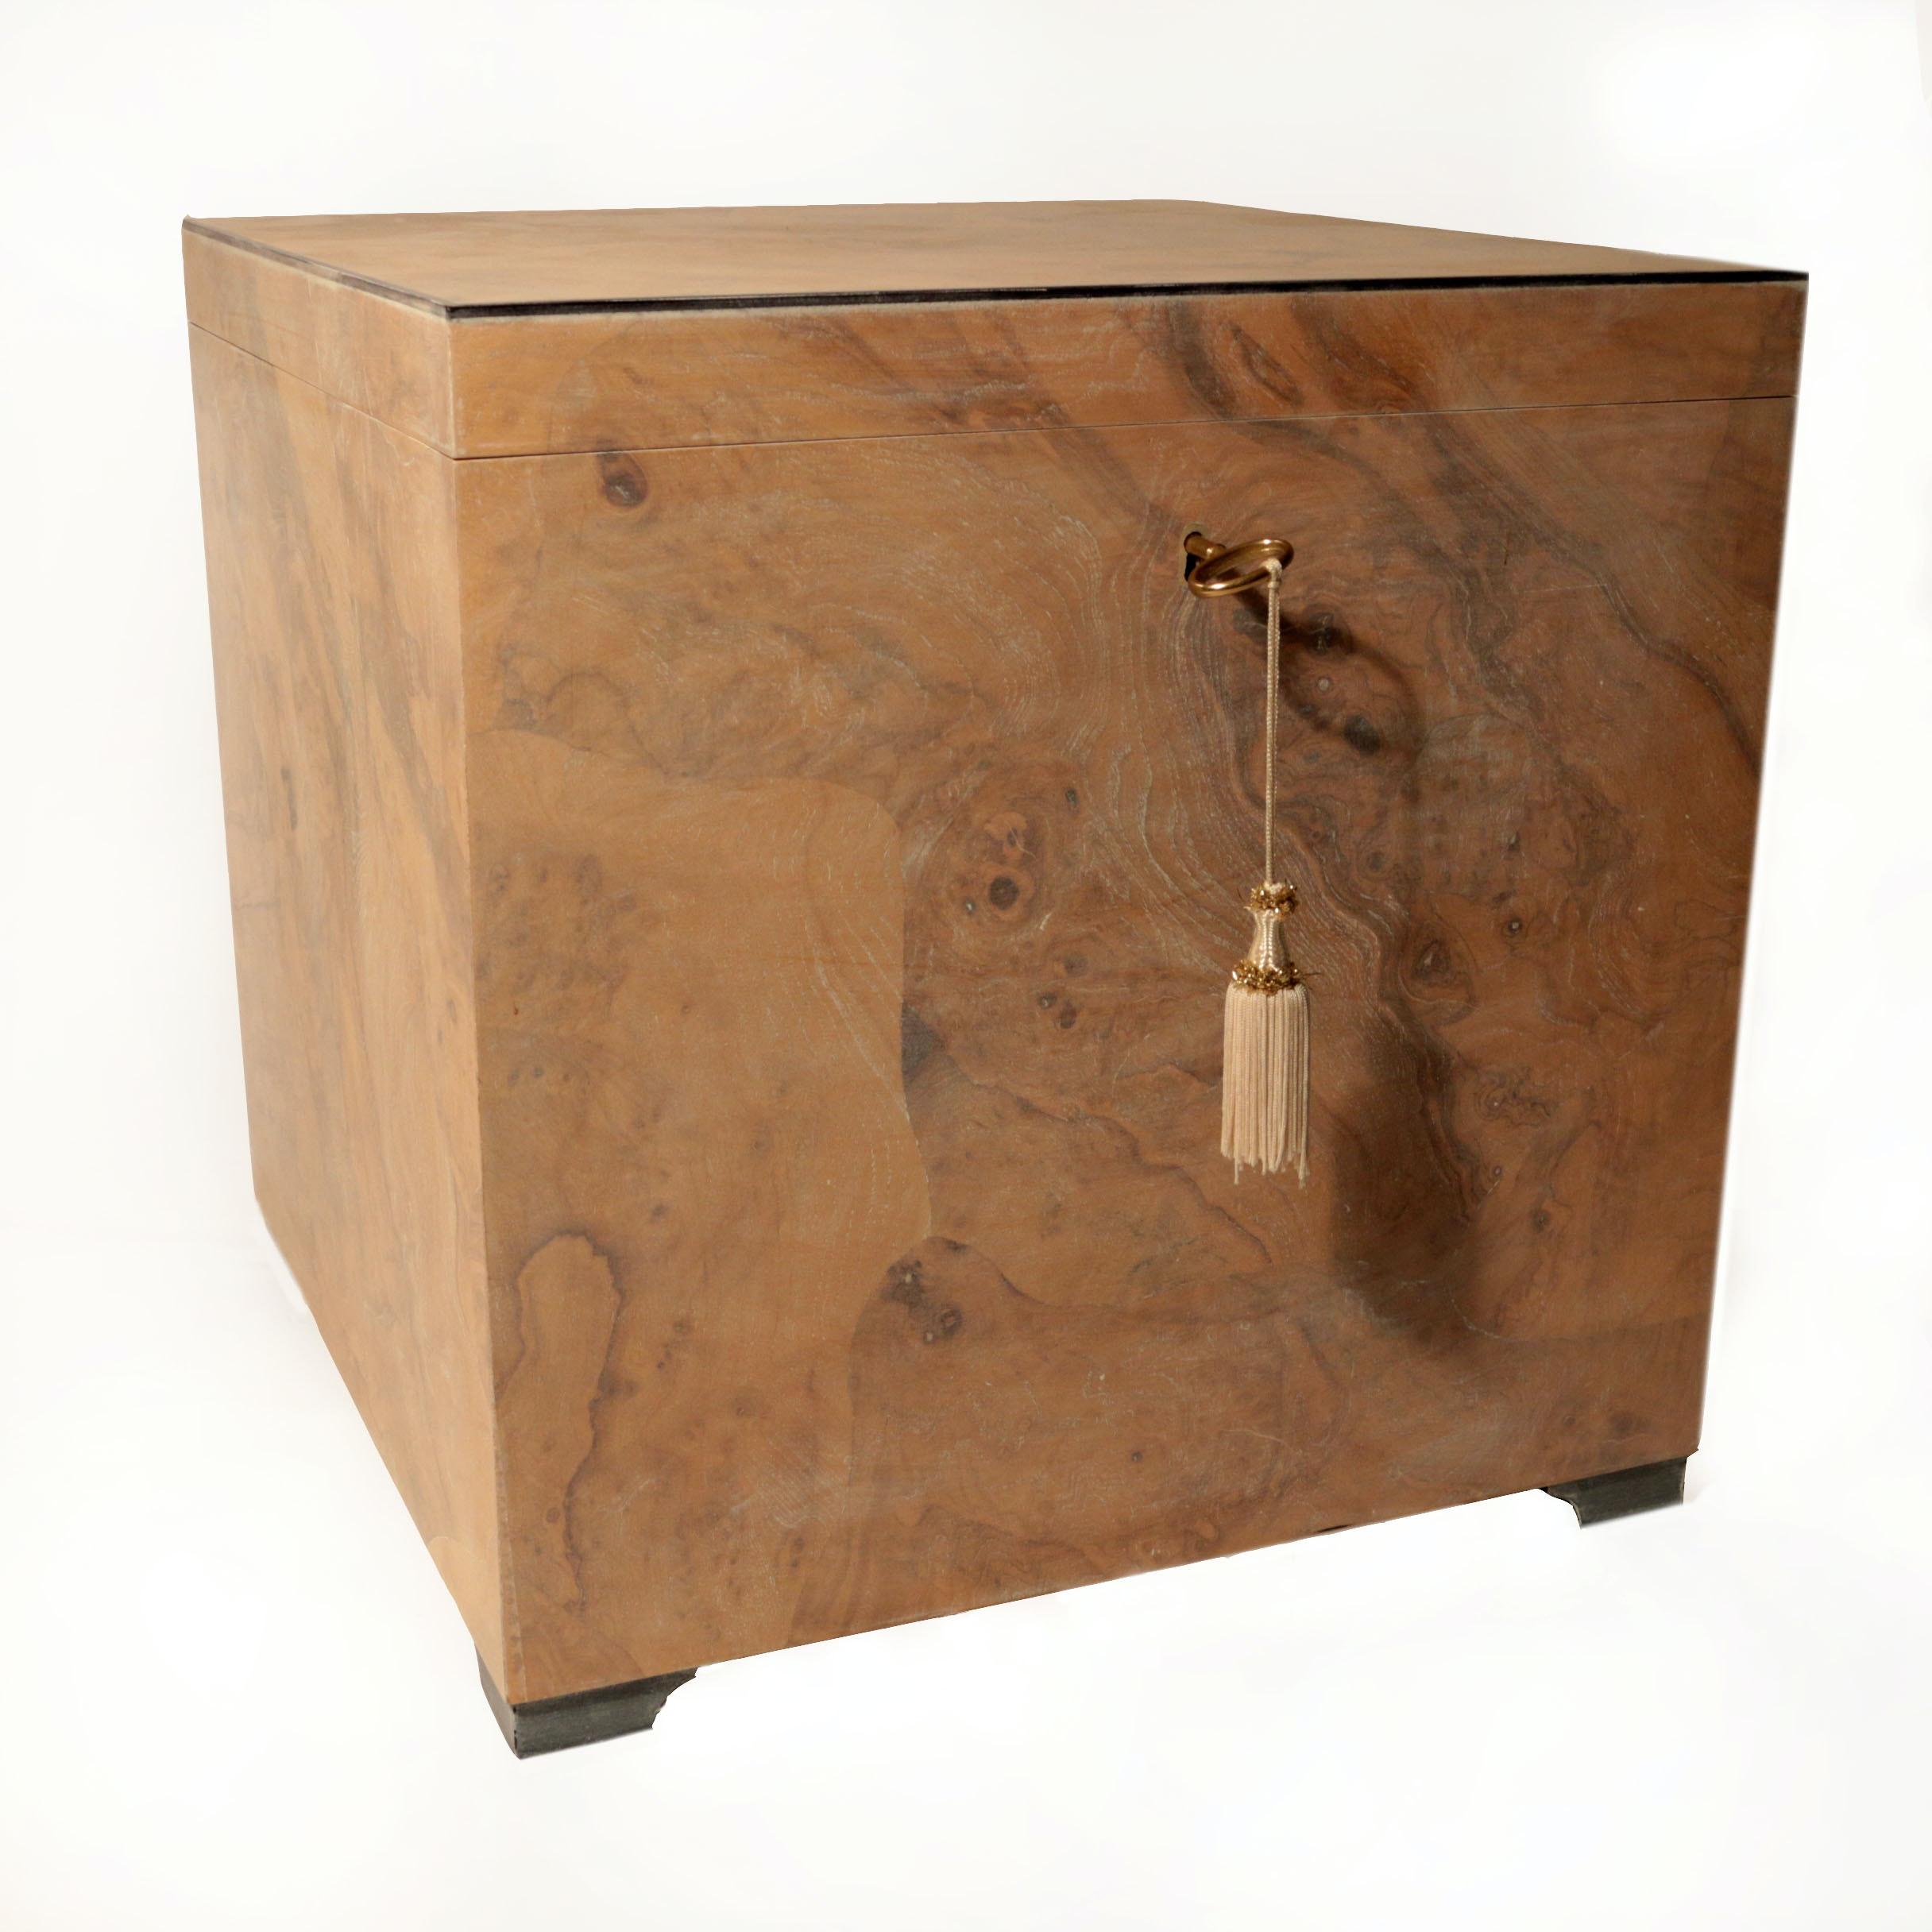 Olive Ash Burl Lidded Box with Key